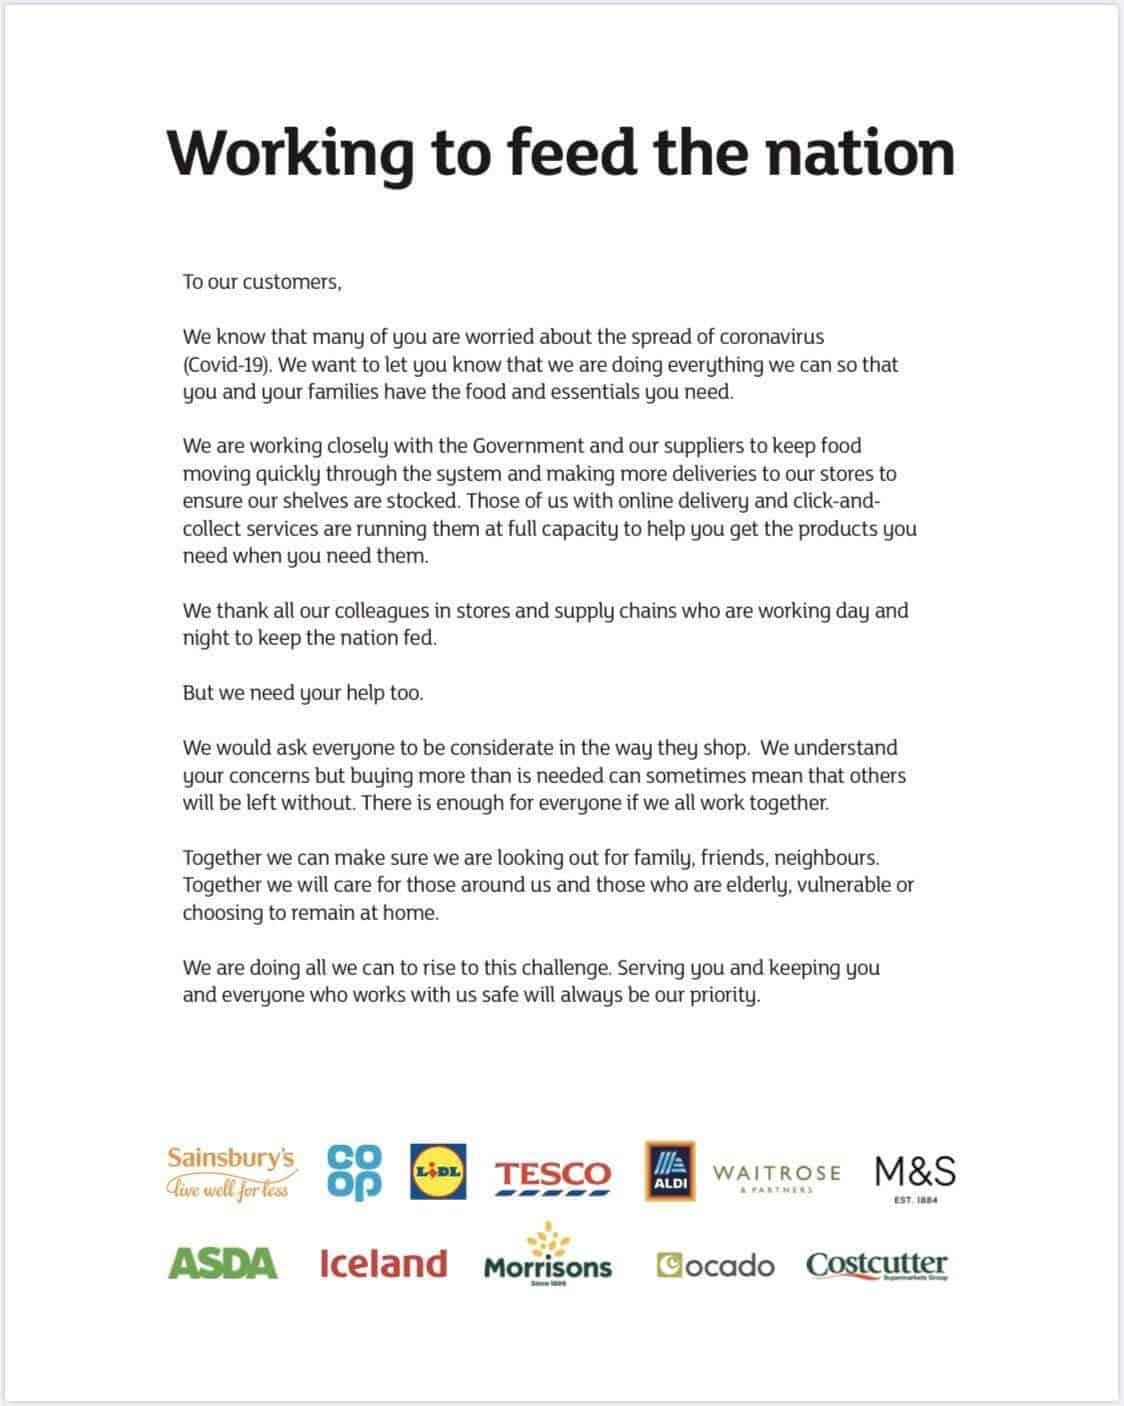 Feeding the nation